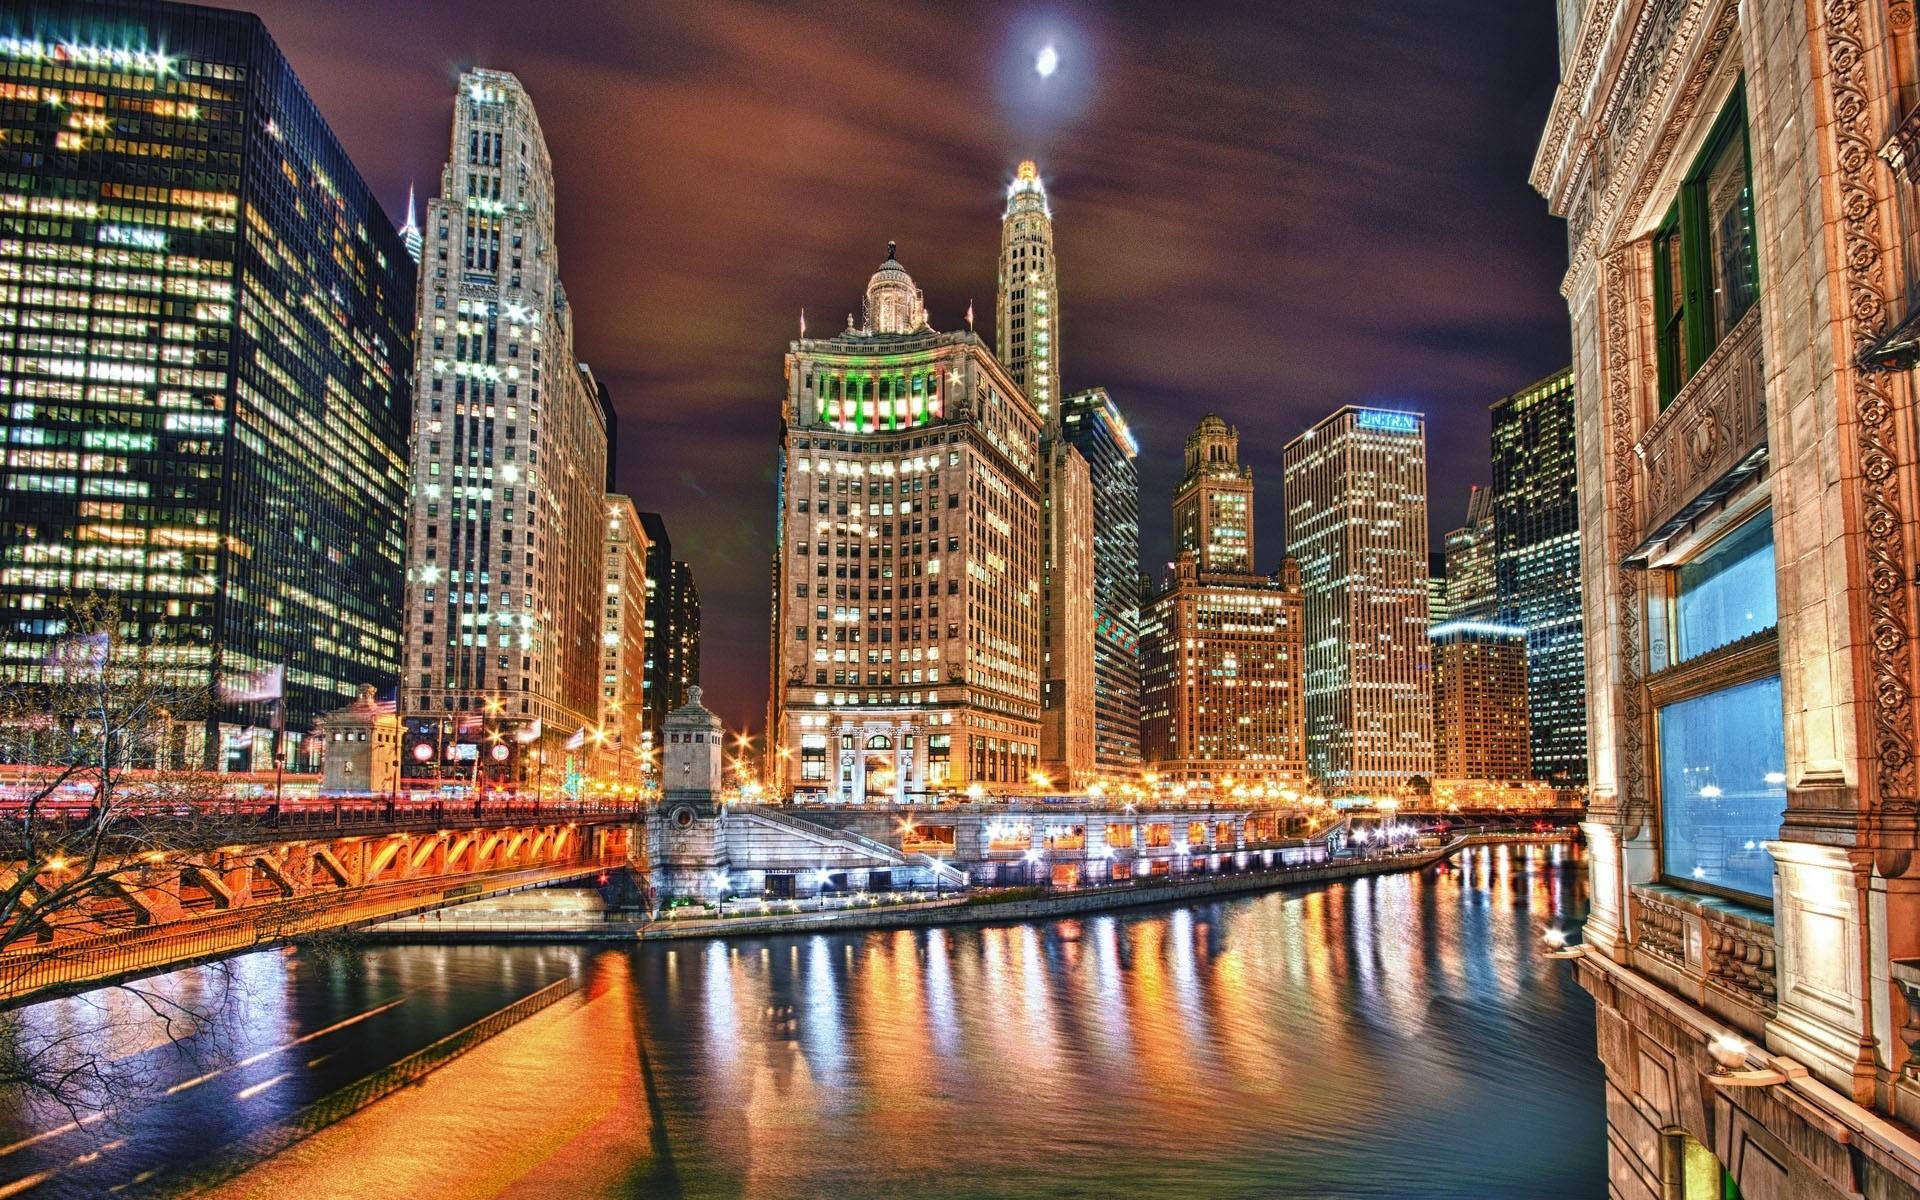 Картинки Город, ночь, река, здание, небоскреб, hdr фото и обои на рабочий стол